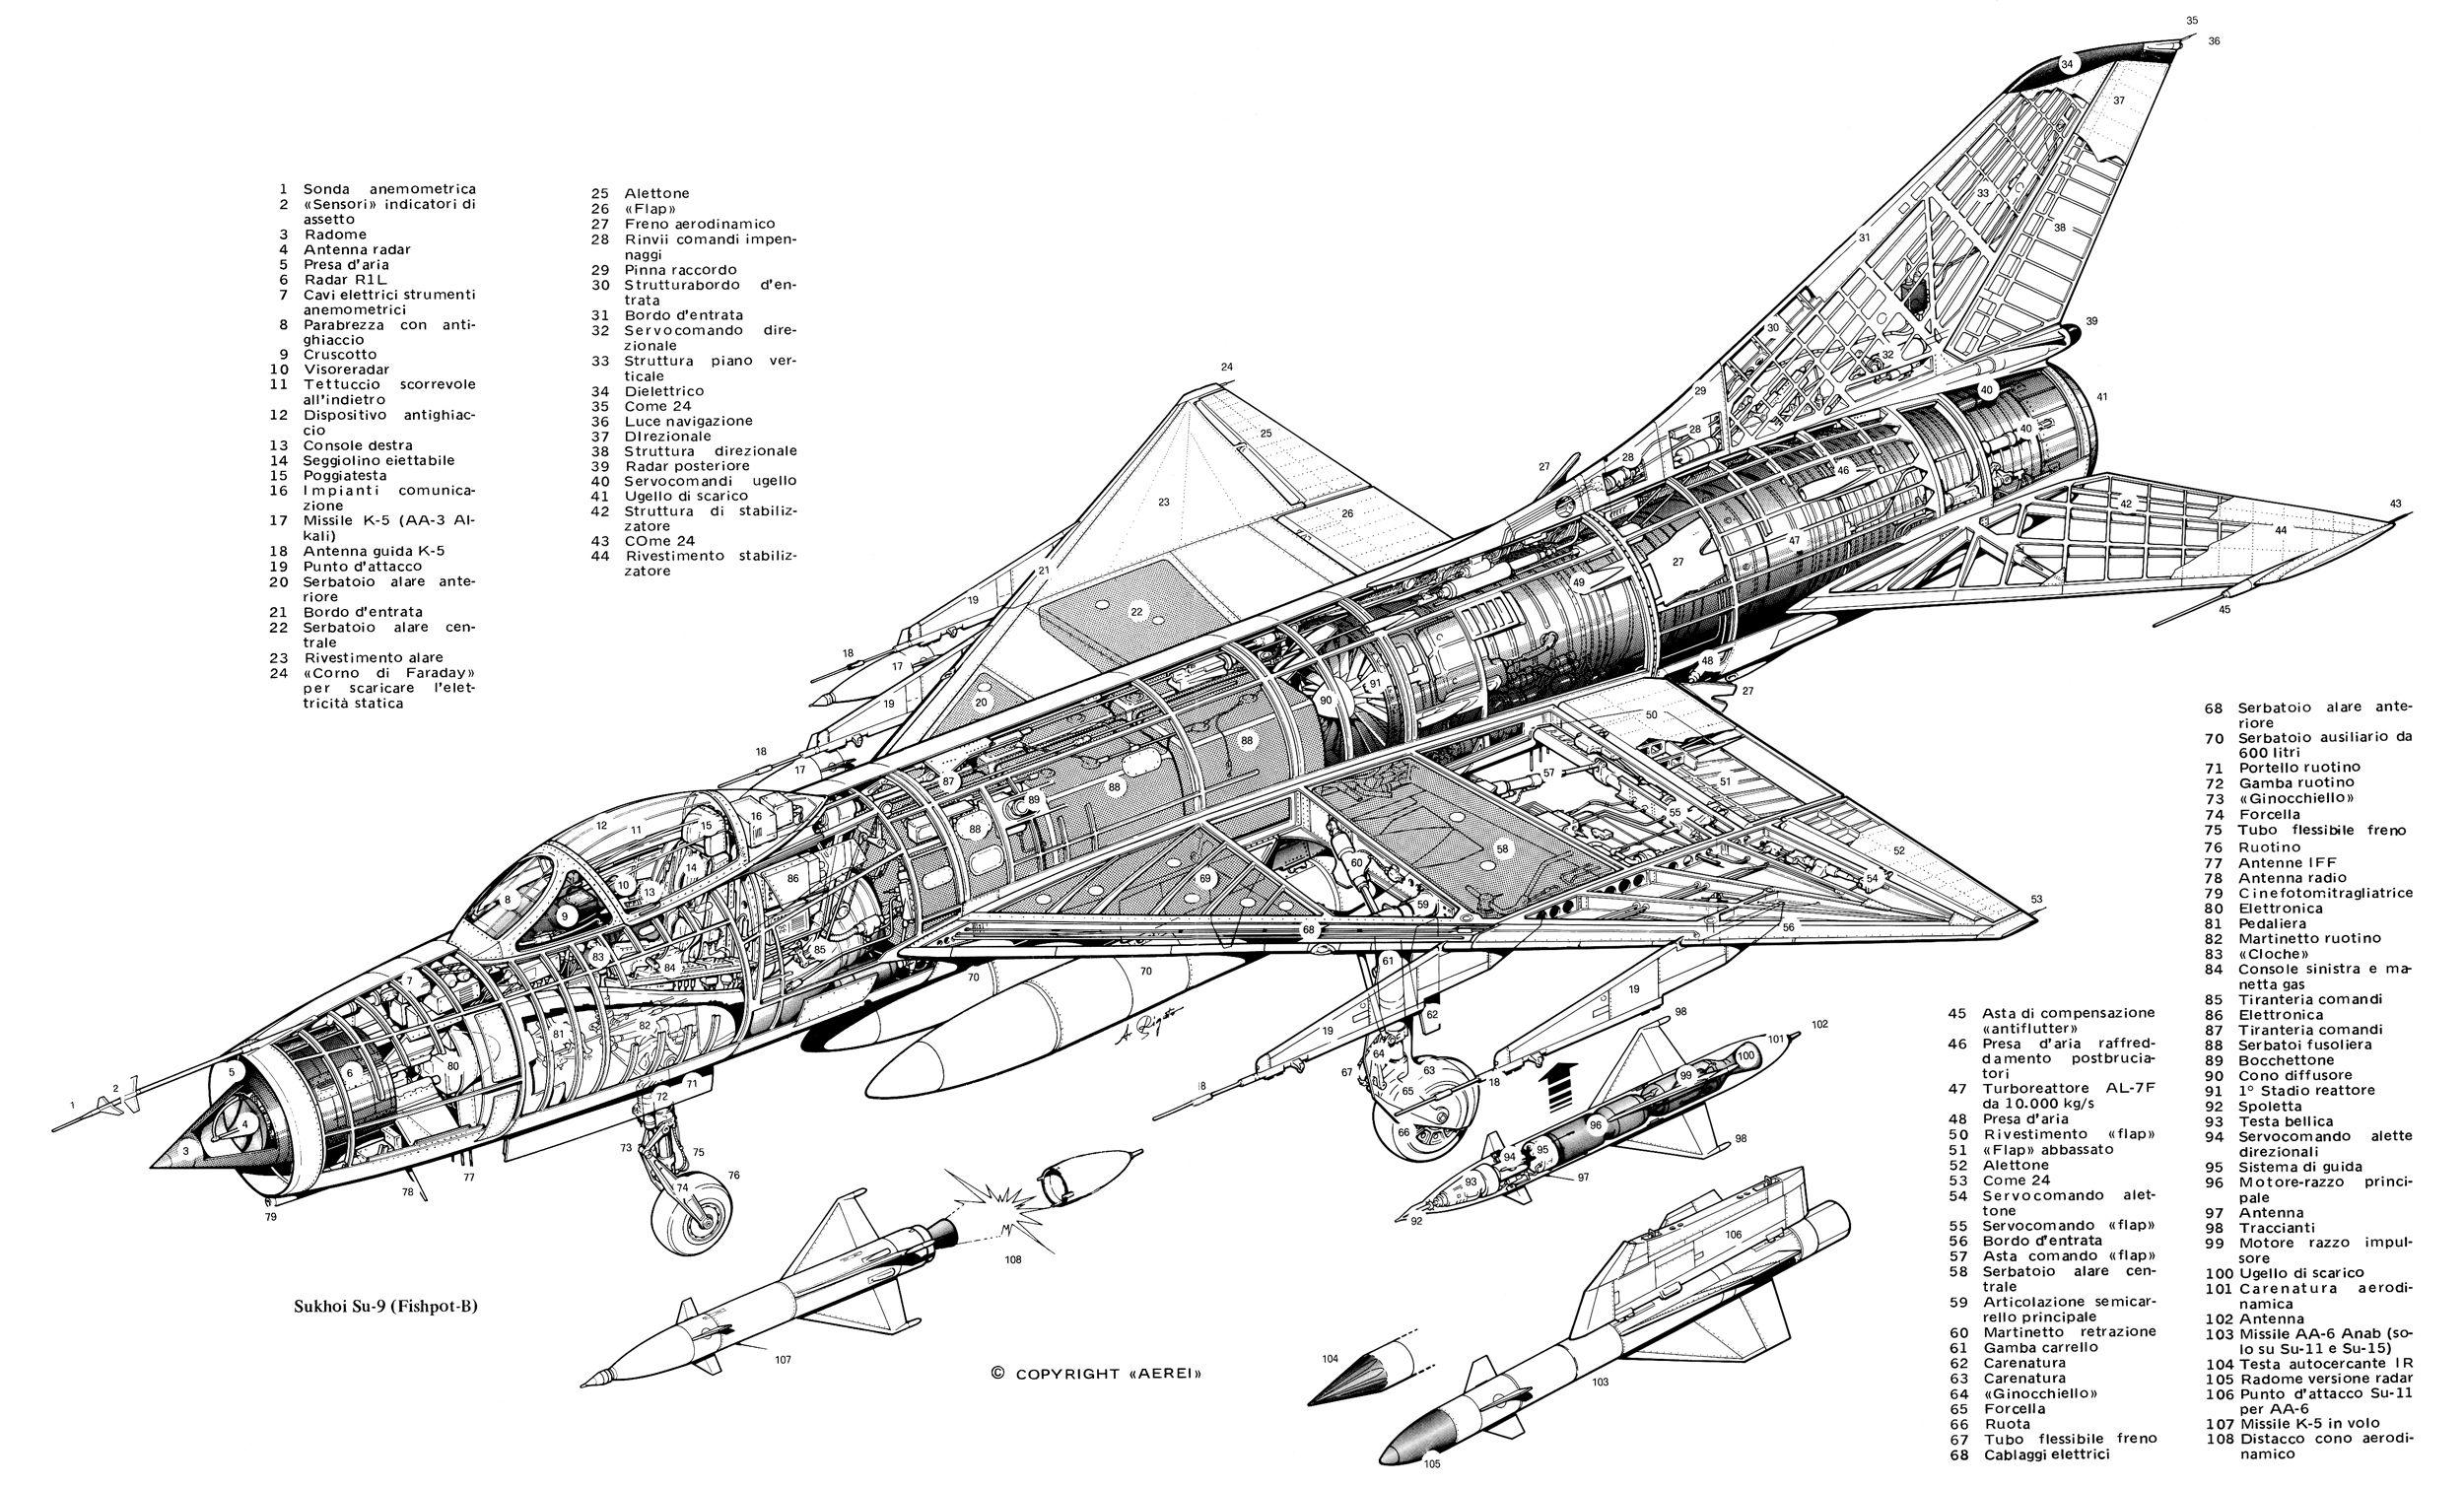 Referencesarlyecho Aviation Sukhoi Su 9